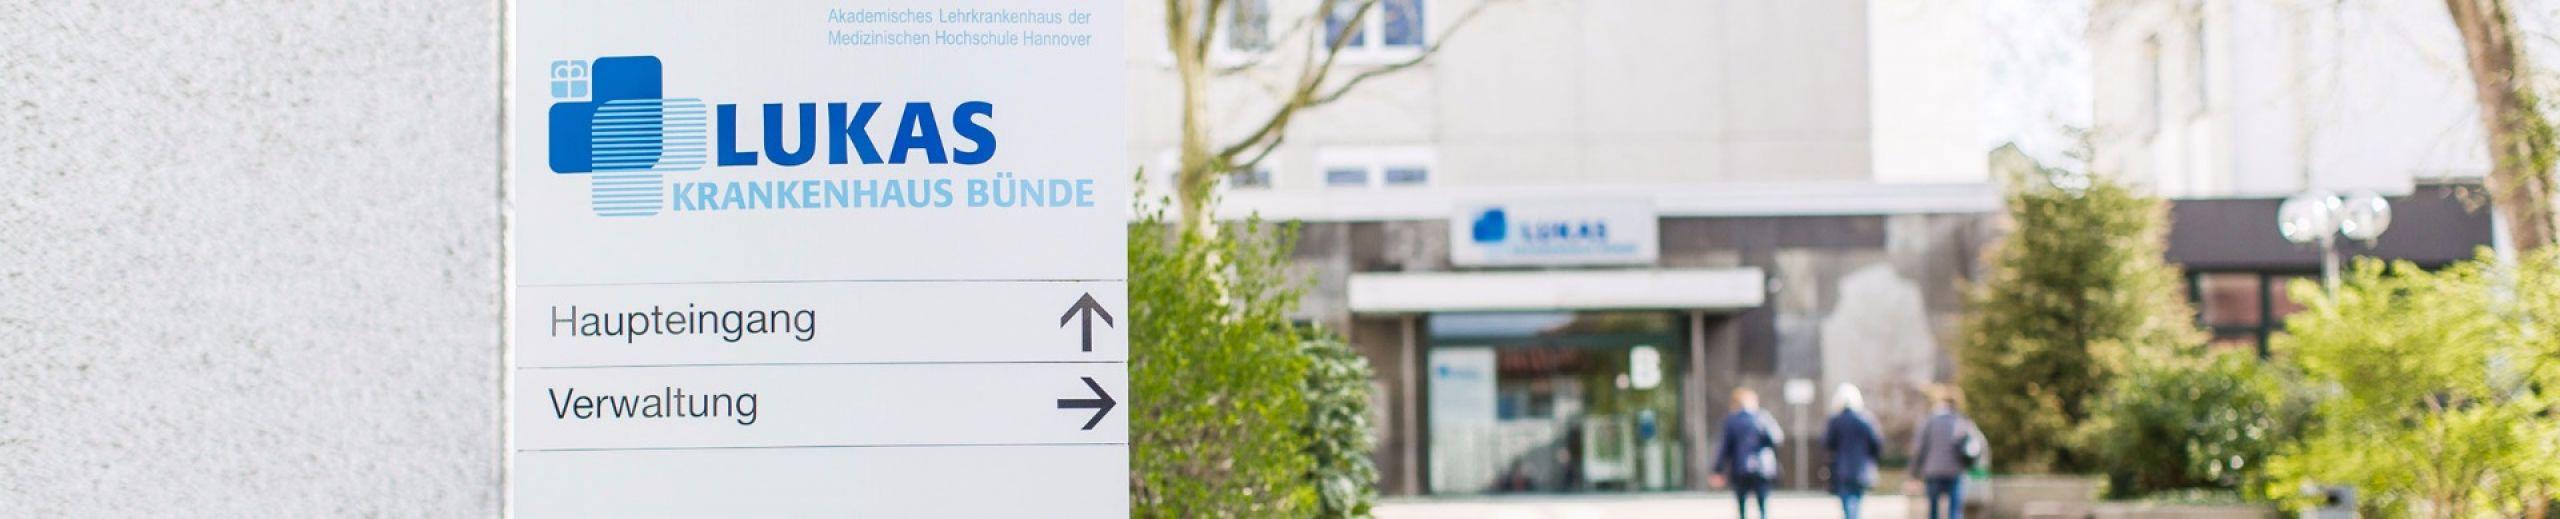 krankenhaus lemgo radiologie